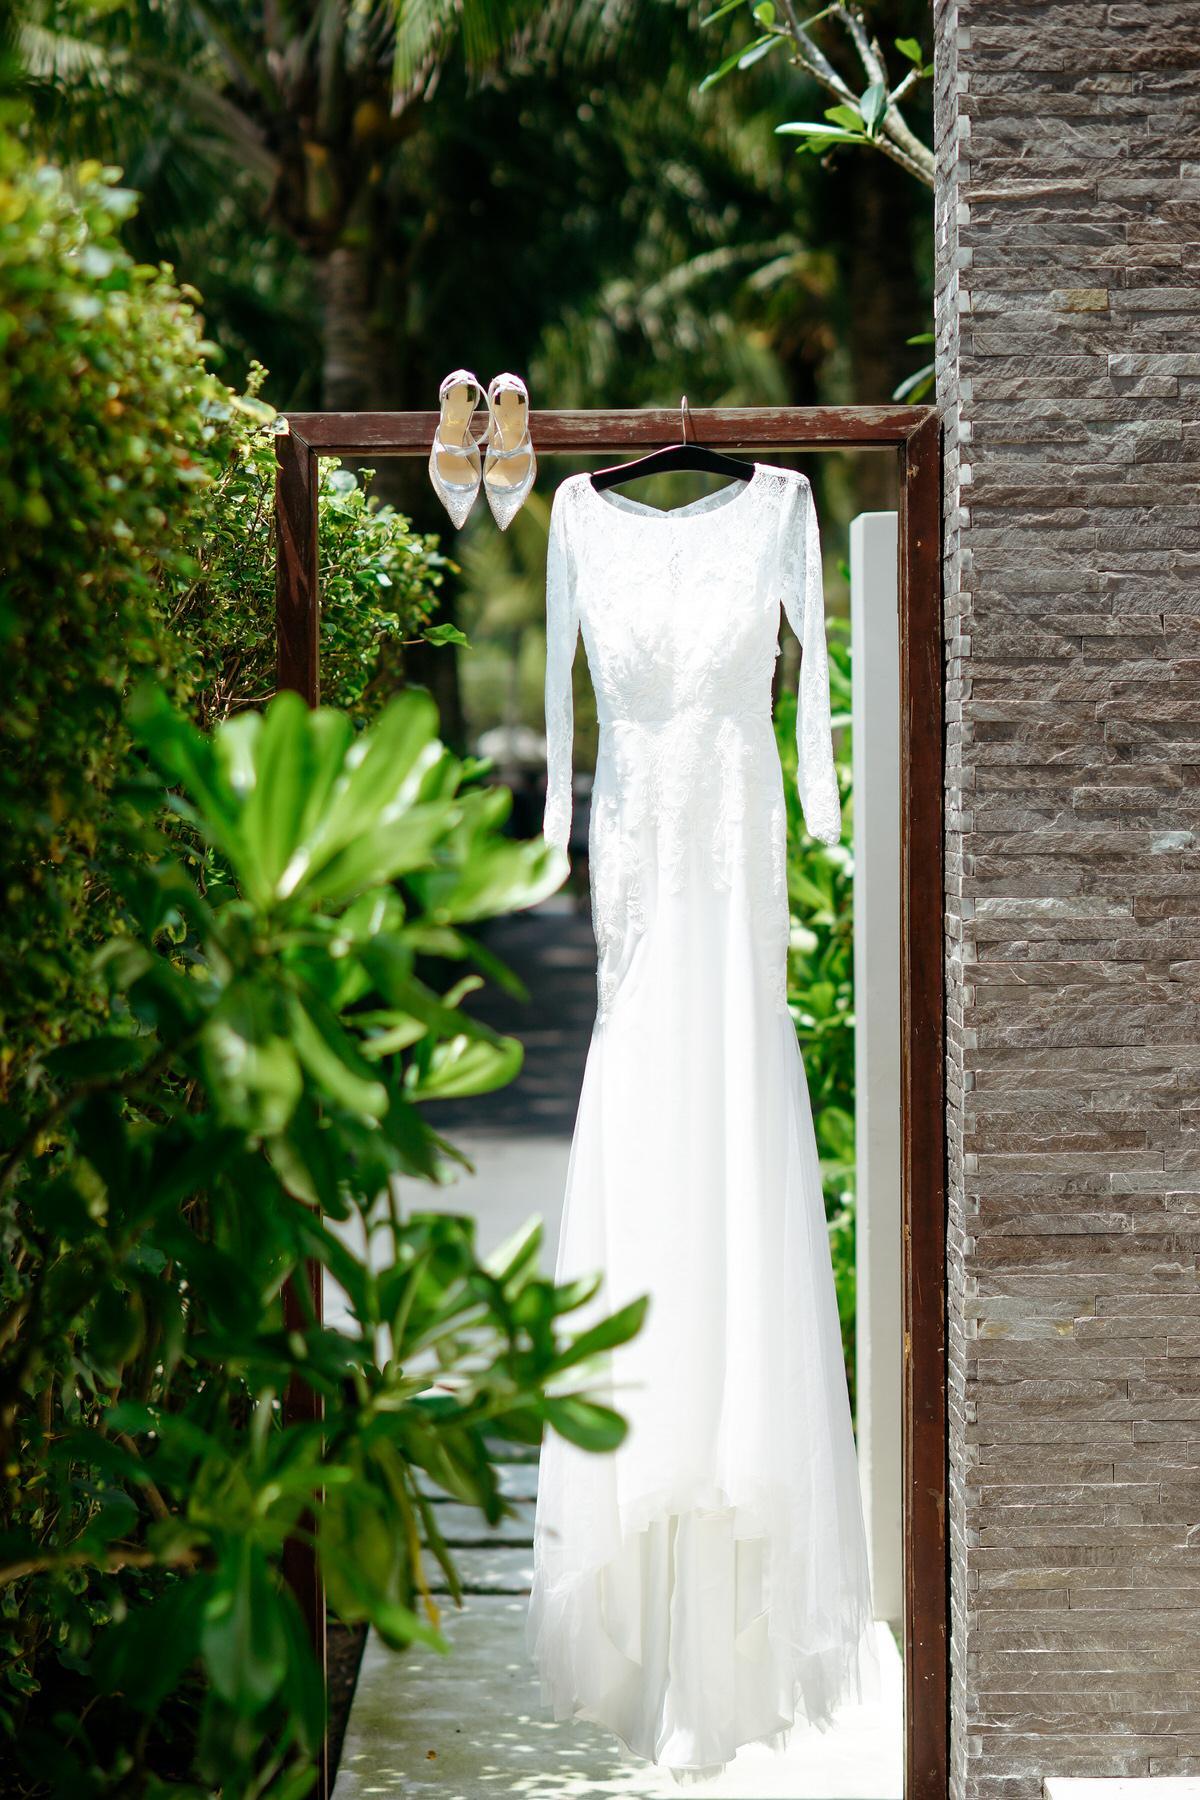 Danang-Hoi An-Wedding-Photography-300.jpg